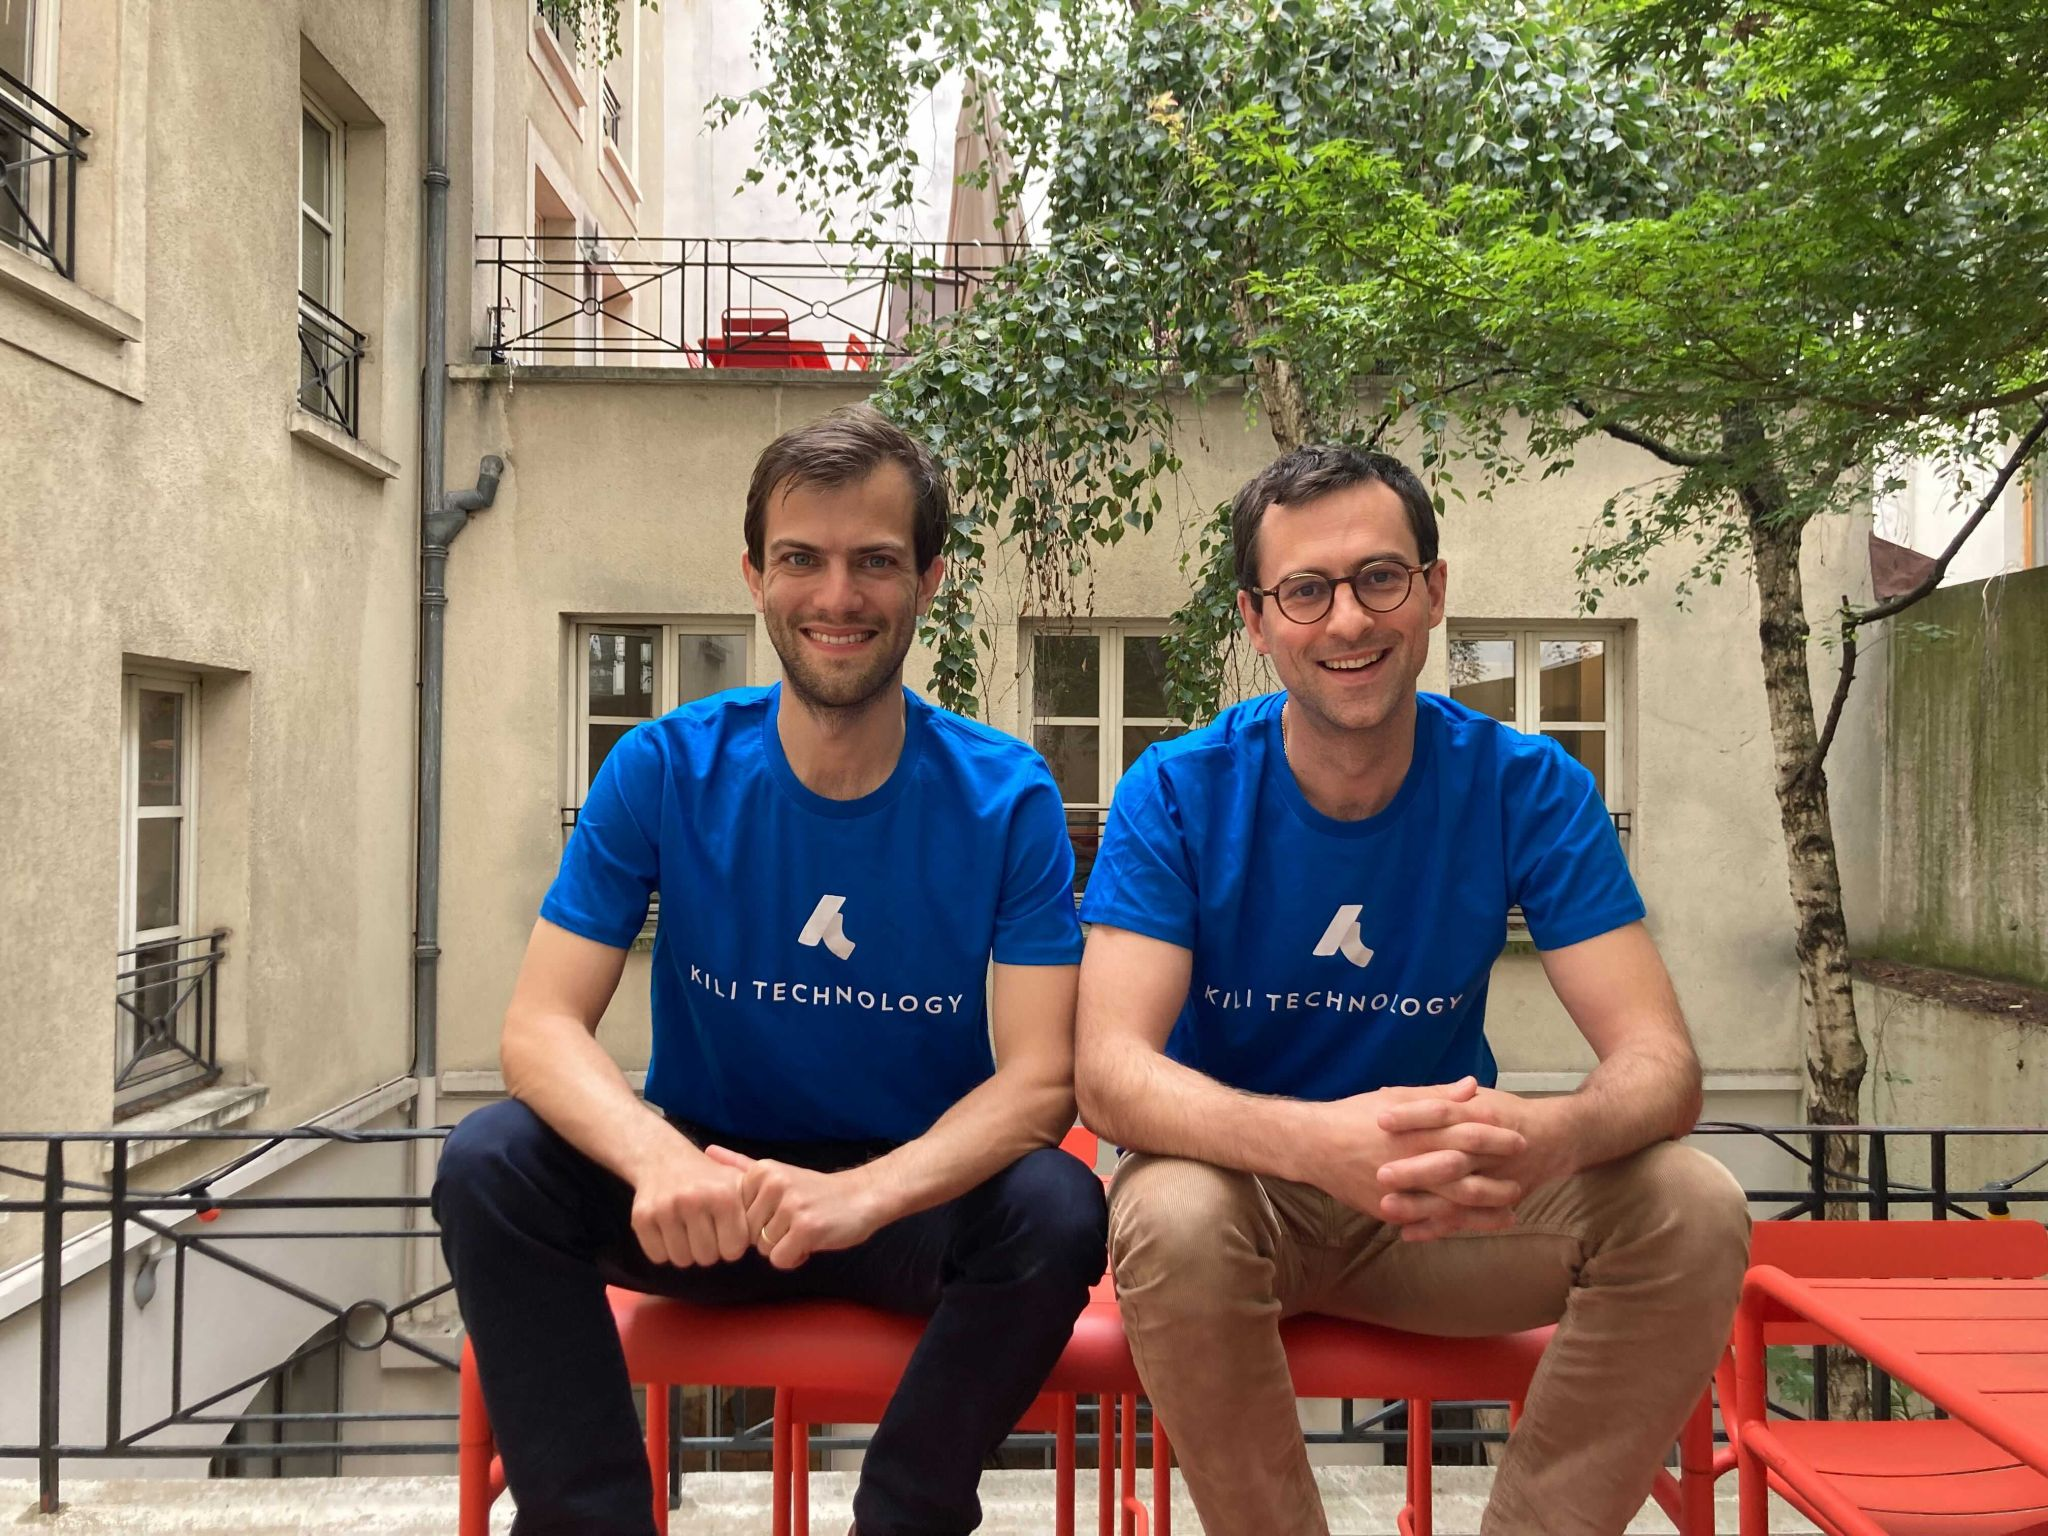 AI data training platform Kili Technology raises $25 million